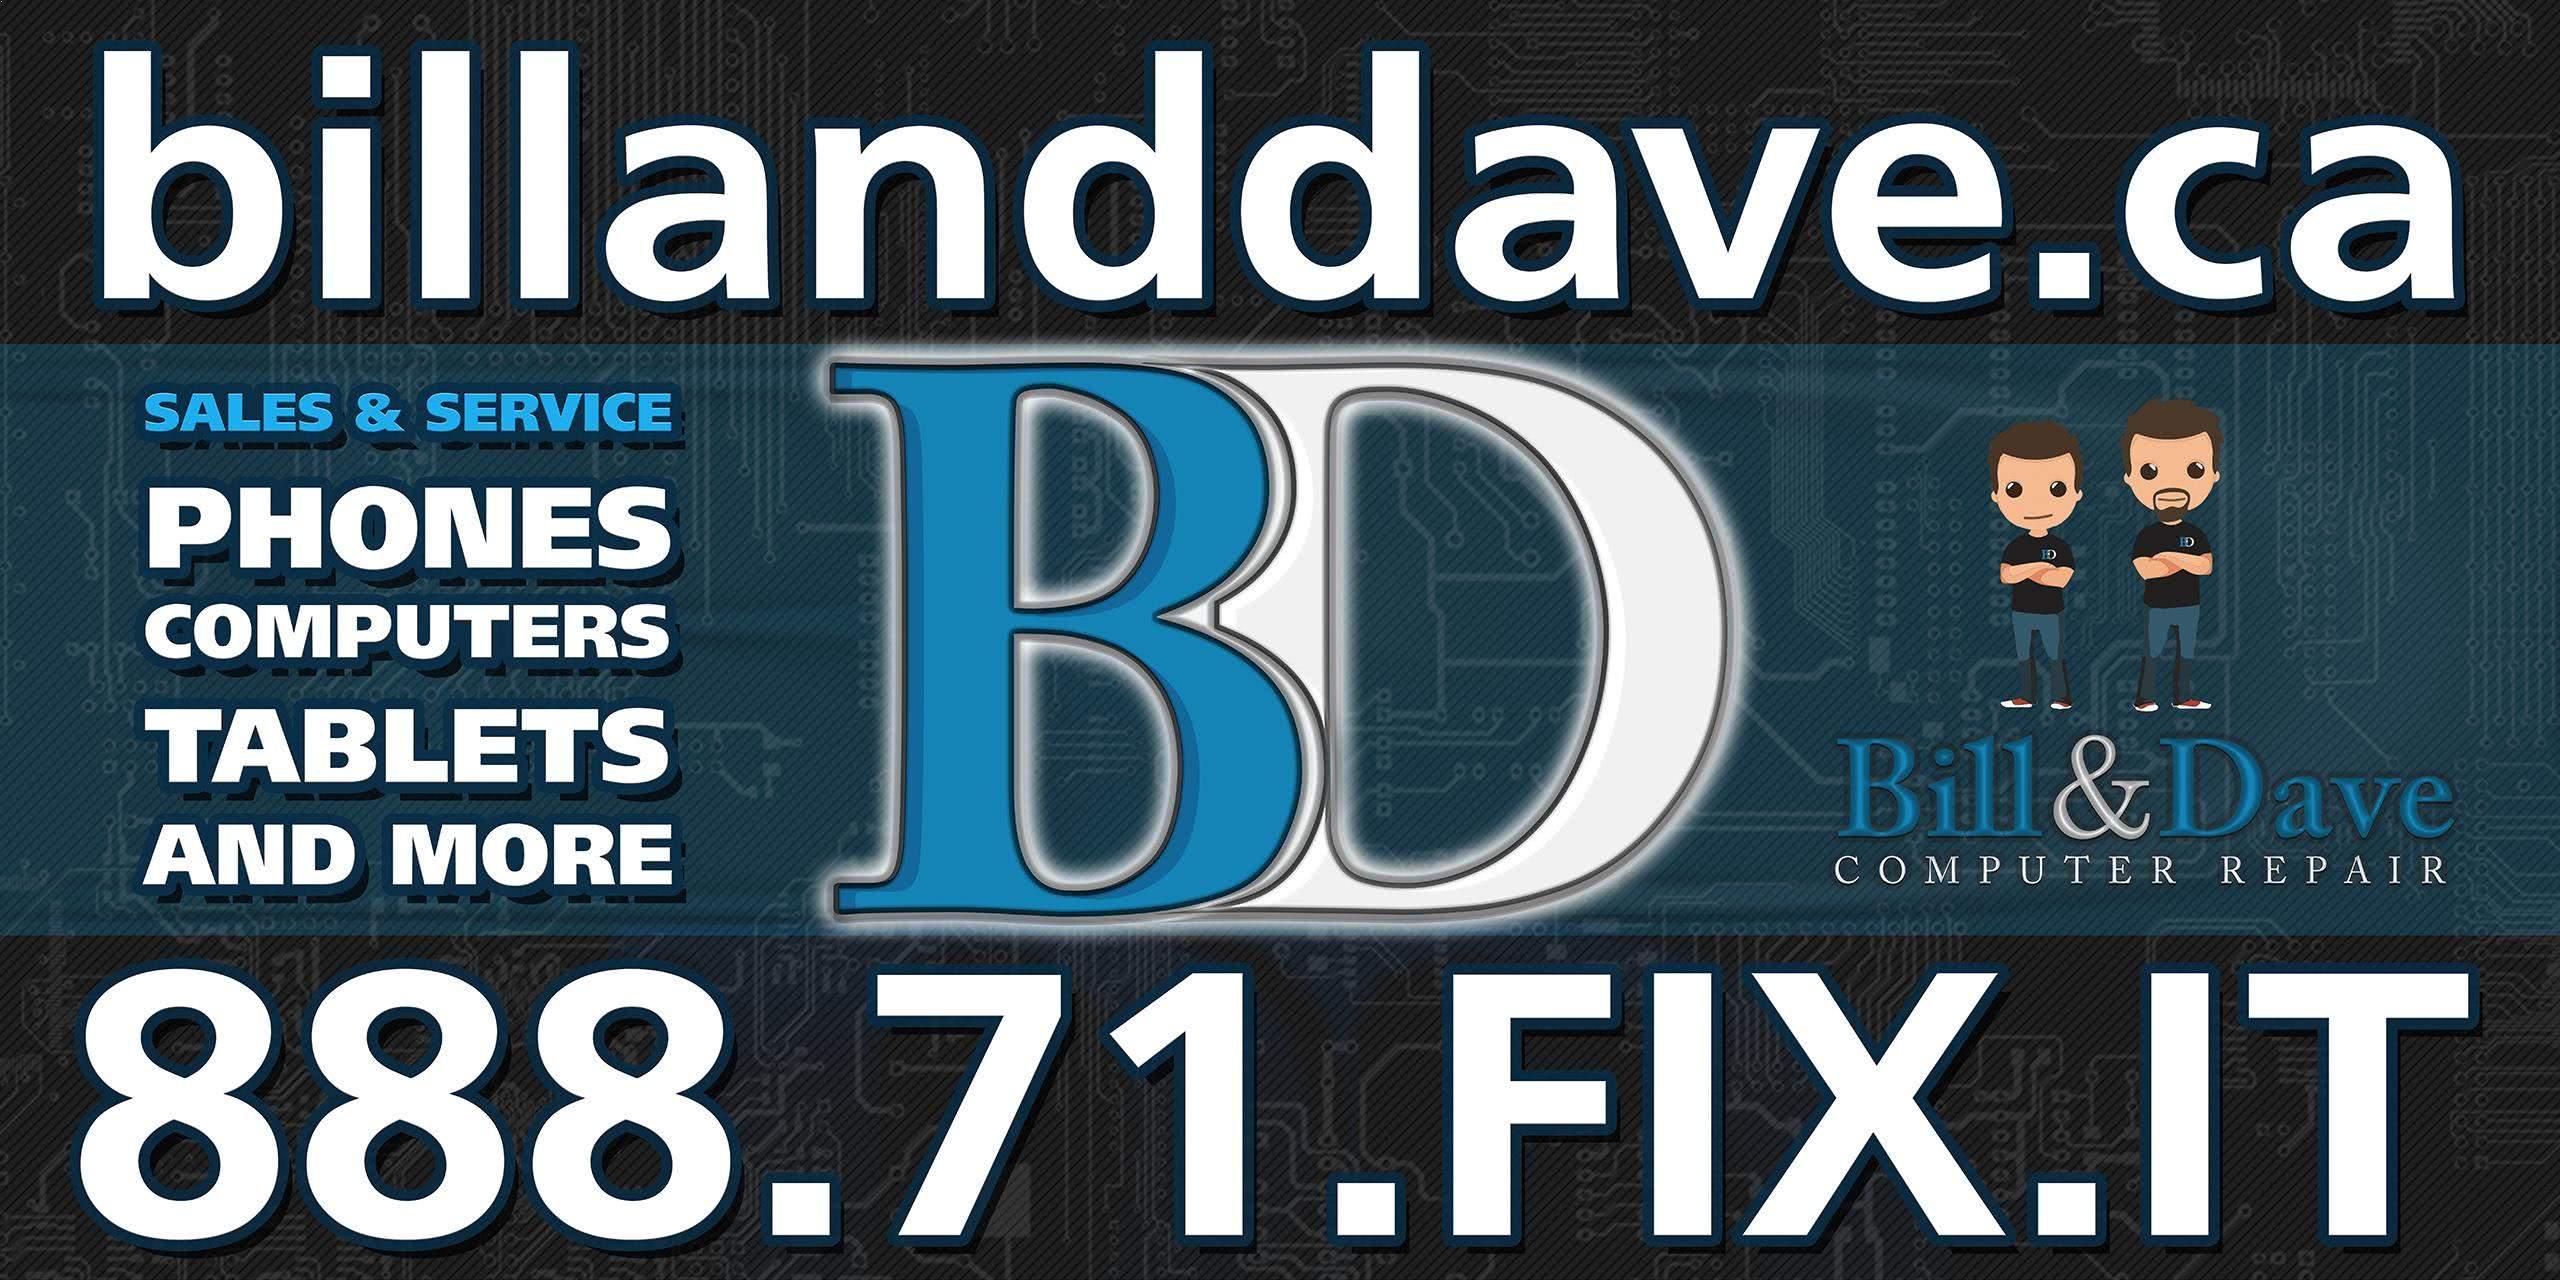 1-888-71-FIXIT Bill and Dave Computer Repair 613-317-1200 www.billanddave.ca